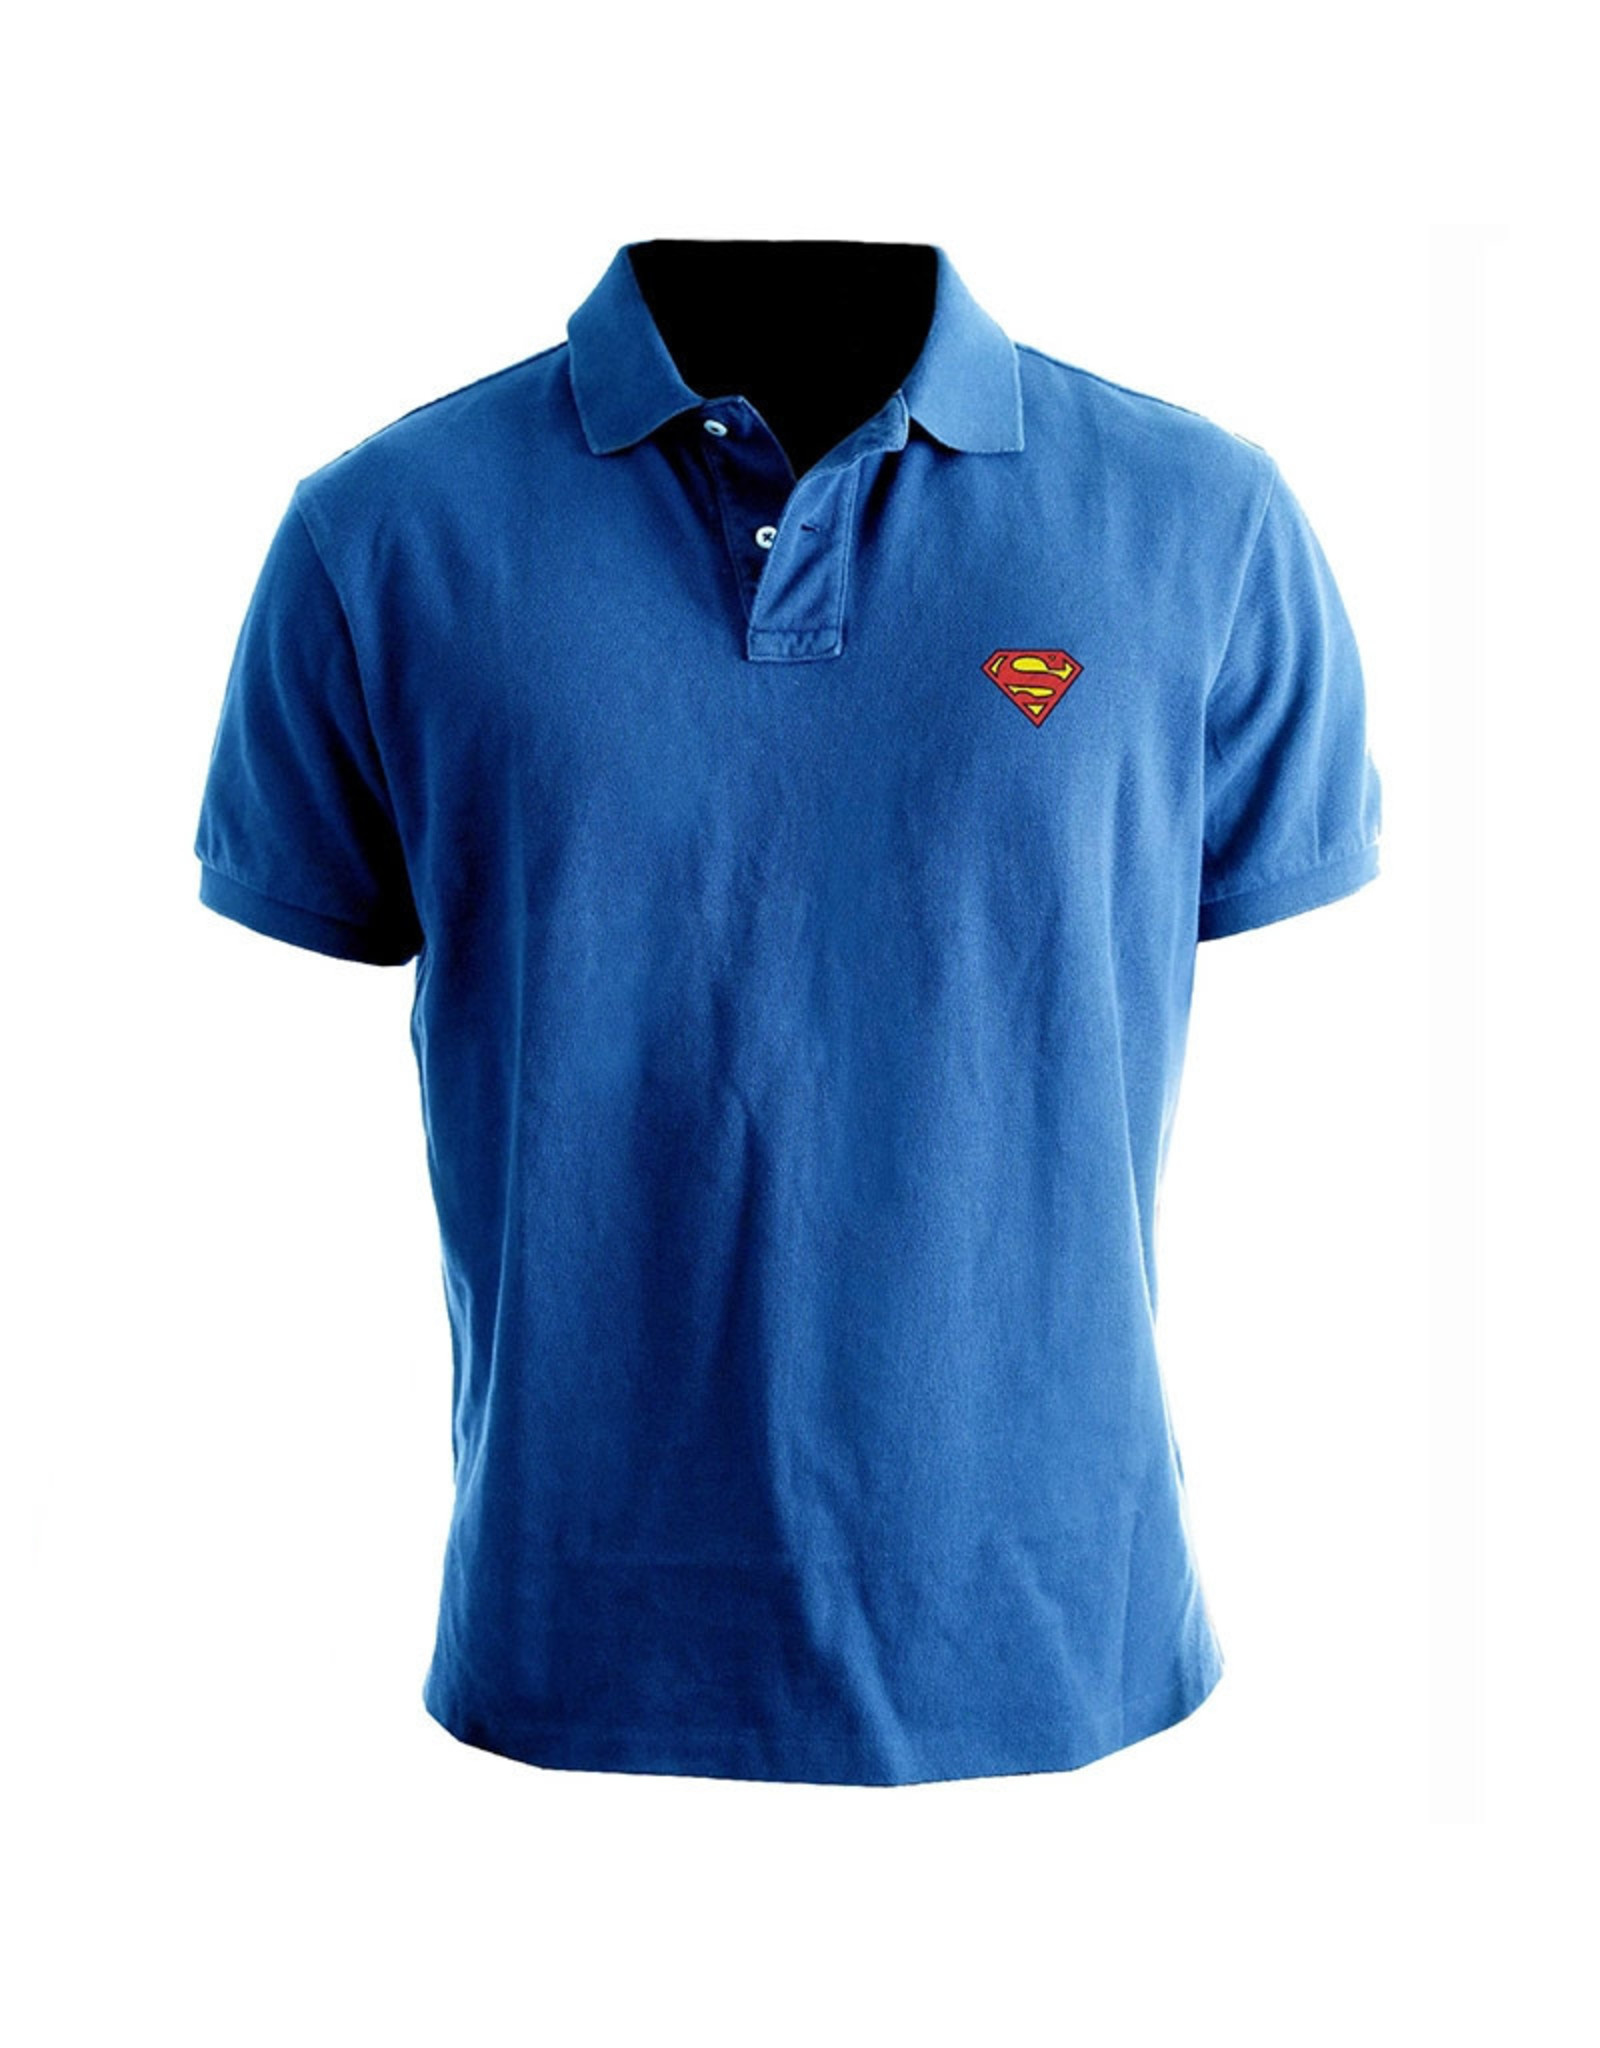 SUPERMAN - Polo - Logo Superman - Cobalt (L)